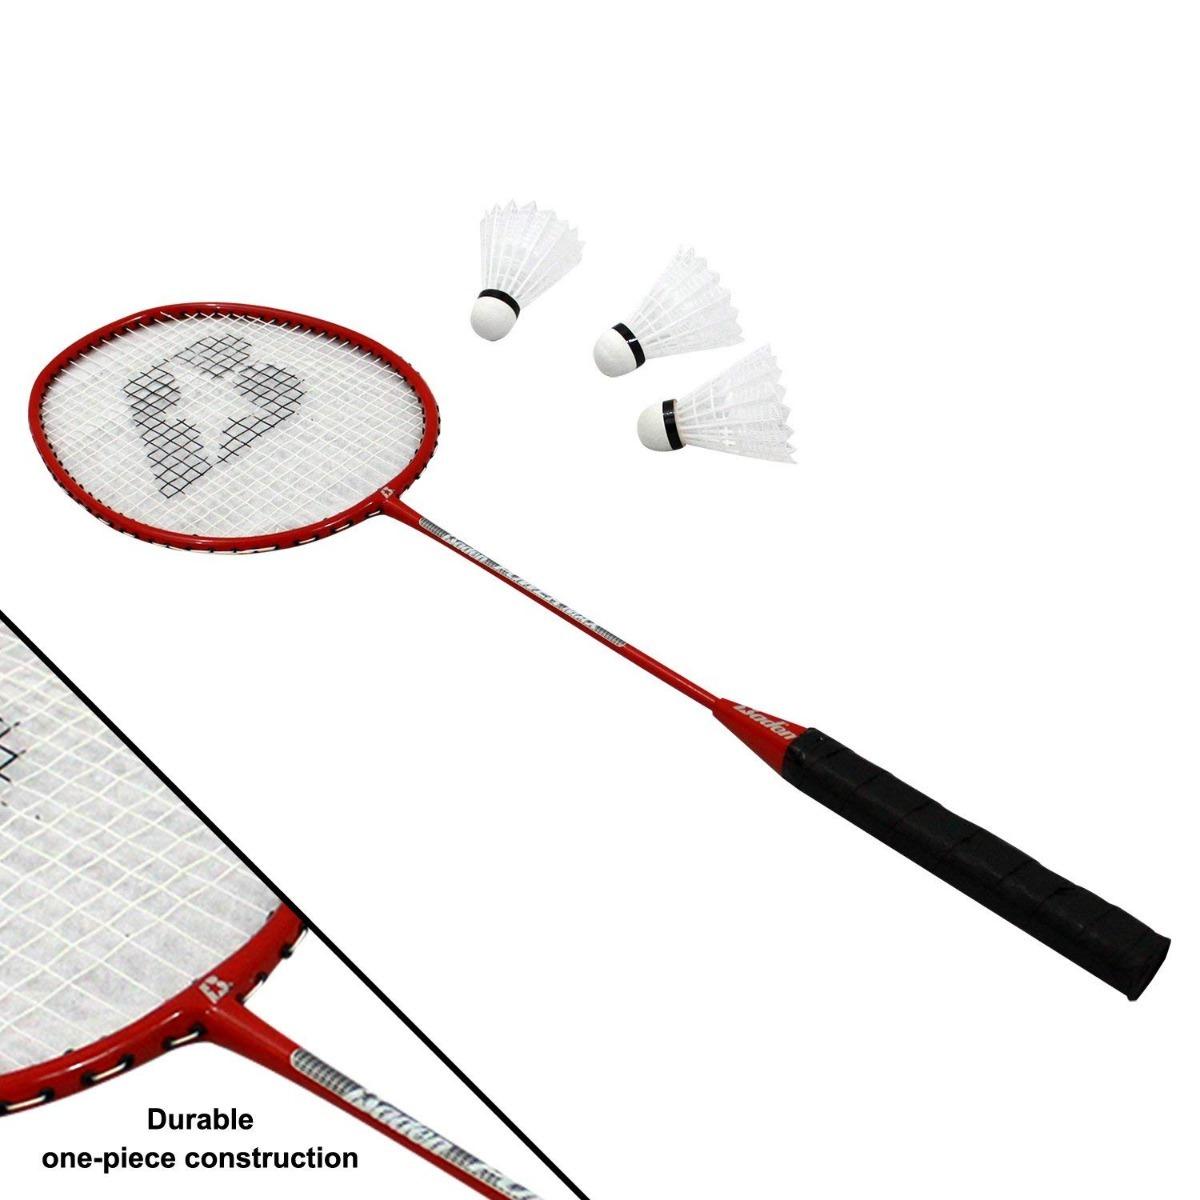 e3a432956 Baden Champions Volleyball Badminton Combo Set  cdjuguetes ...